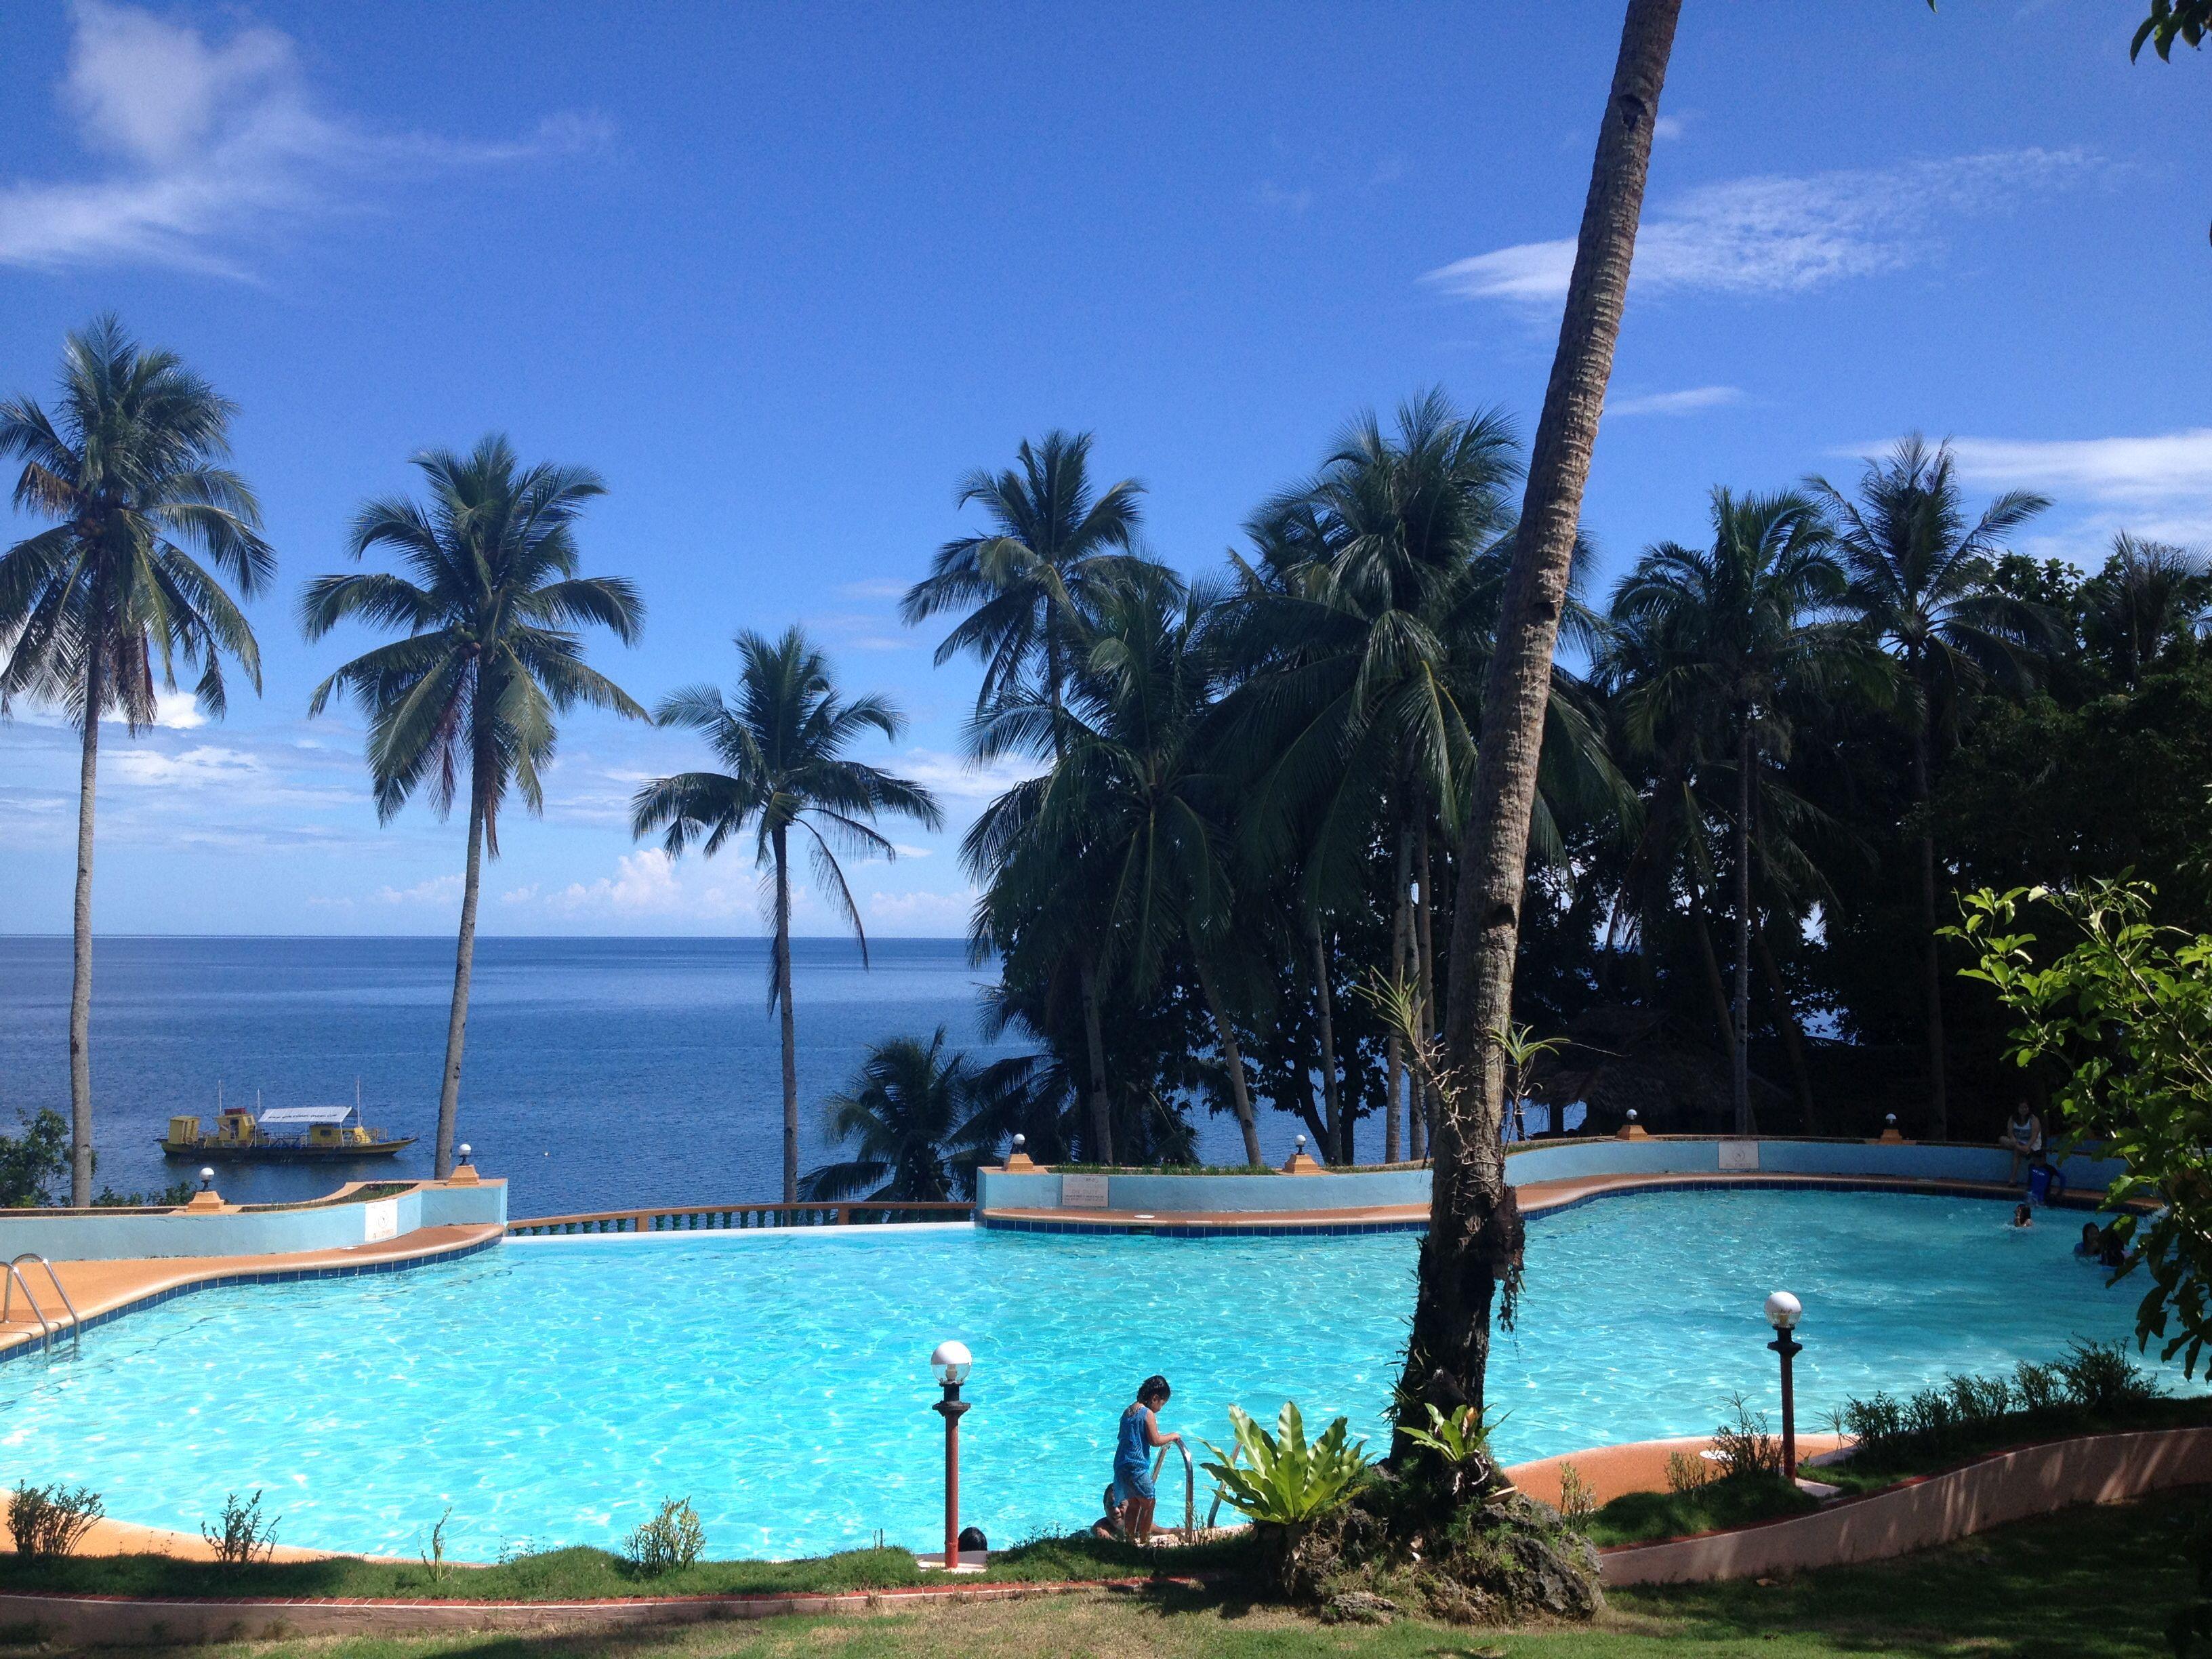 Manaya Beach Resort In my hometown